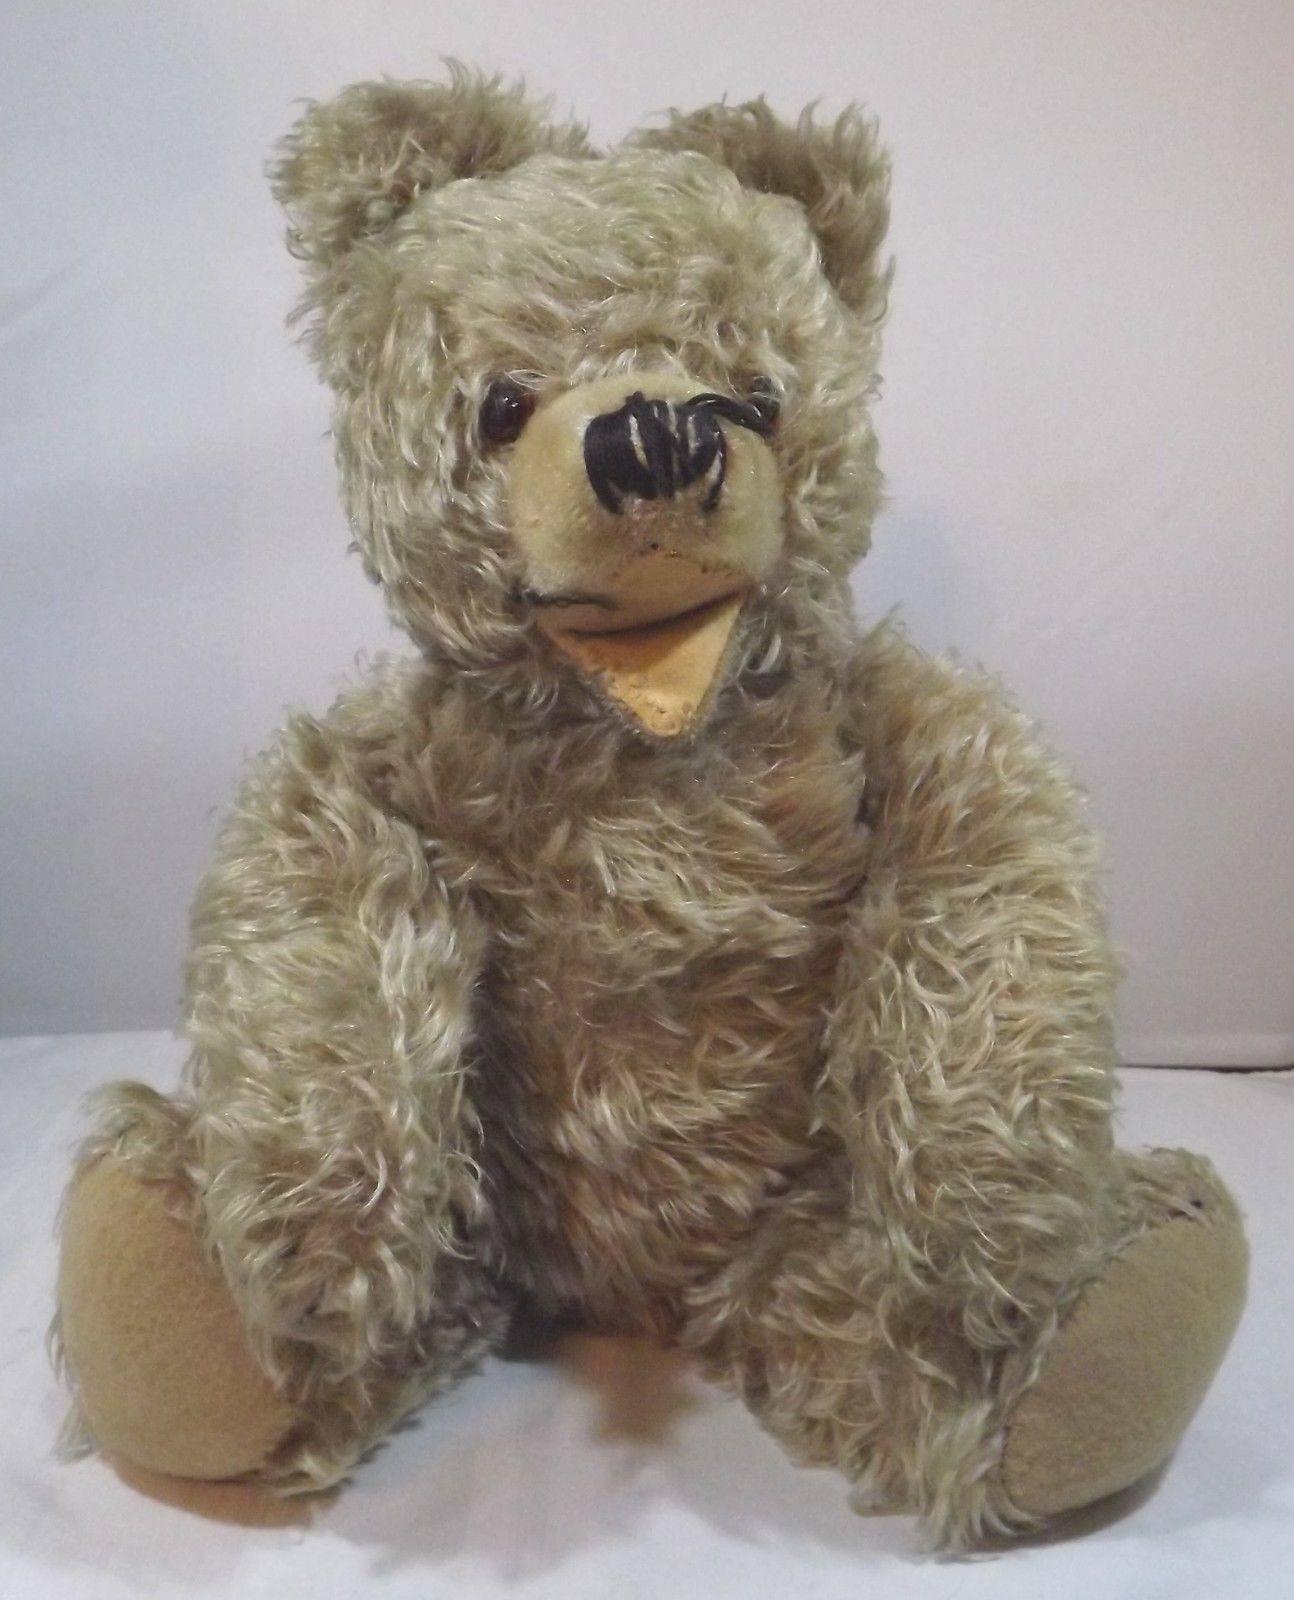 Vintage 1960s 43cm German Zotty-Type Jointed Mohair Teddy Bear - Needs Repair